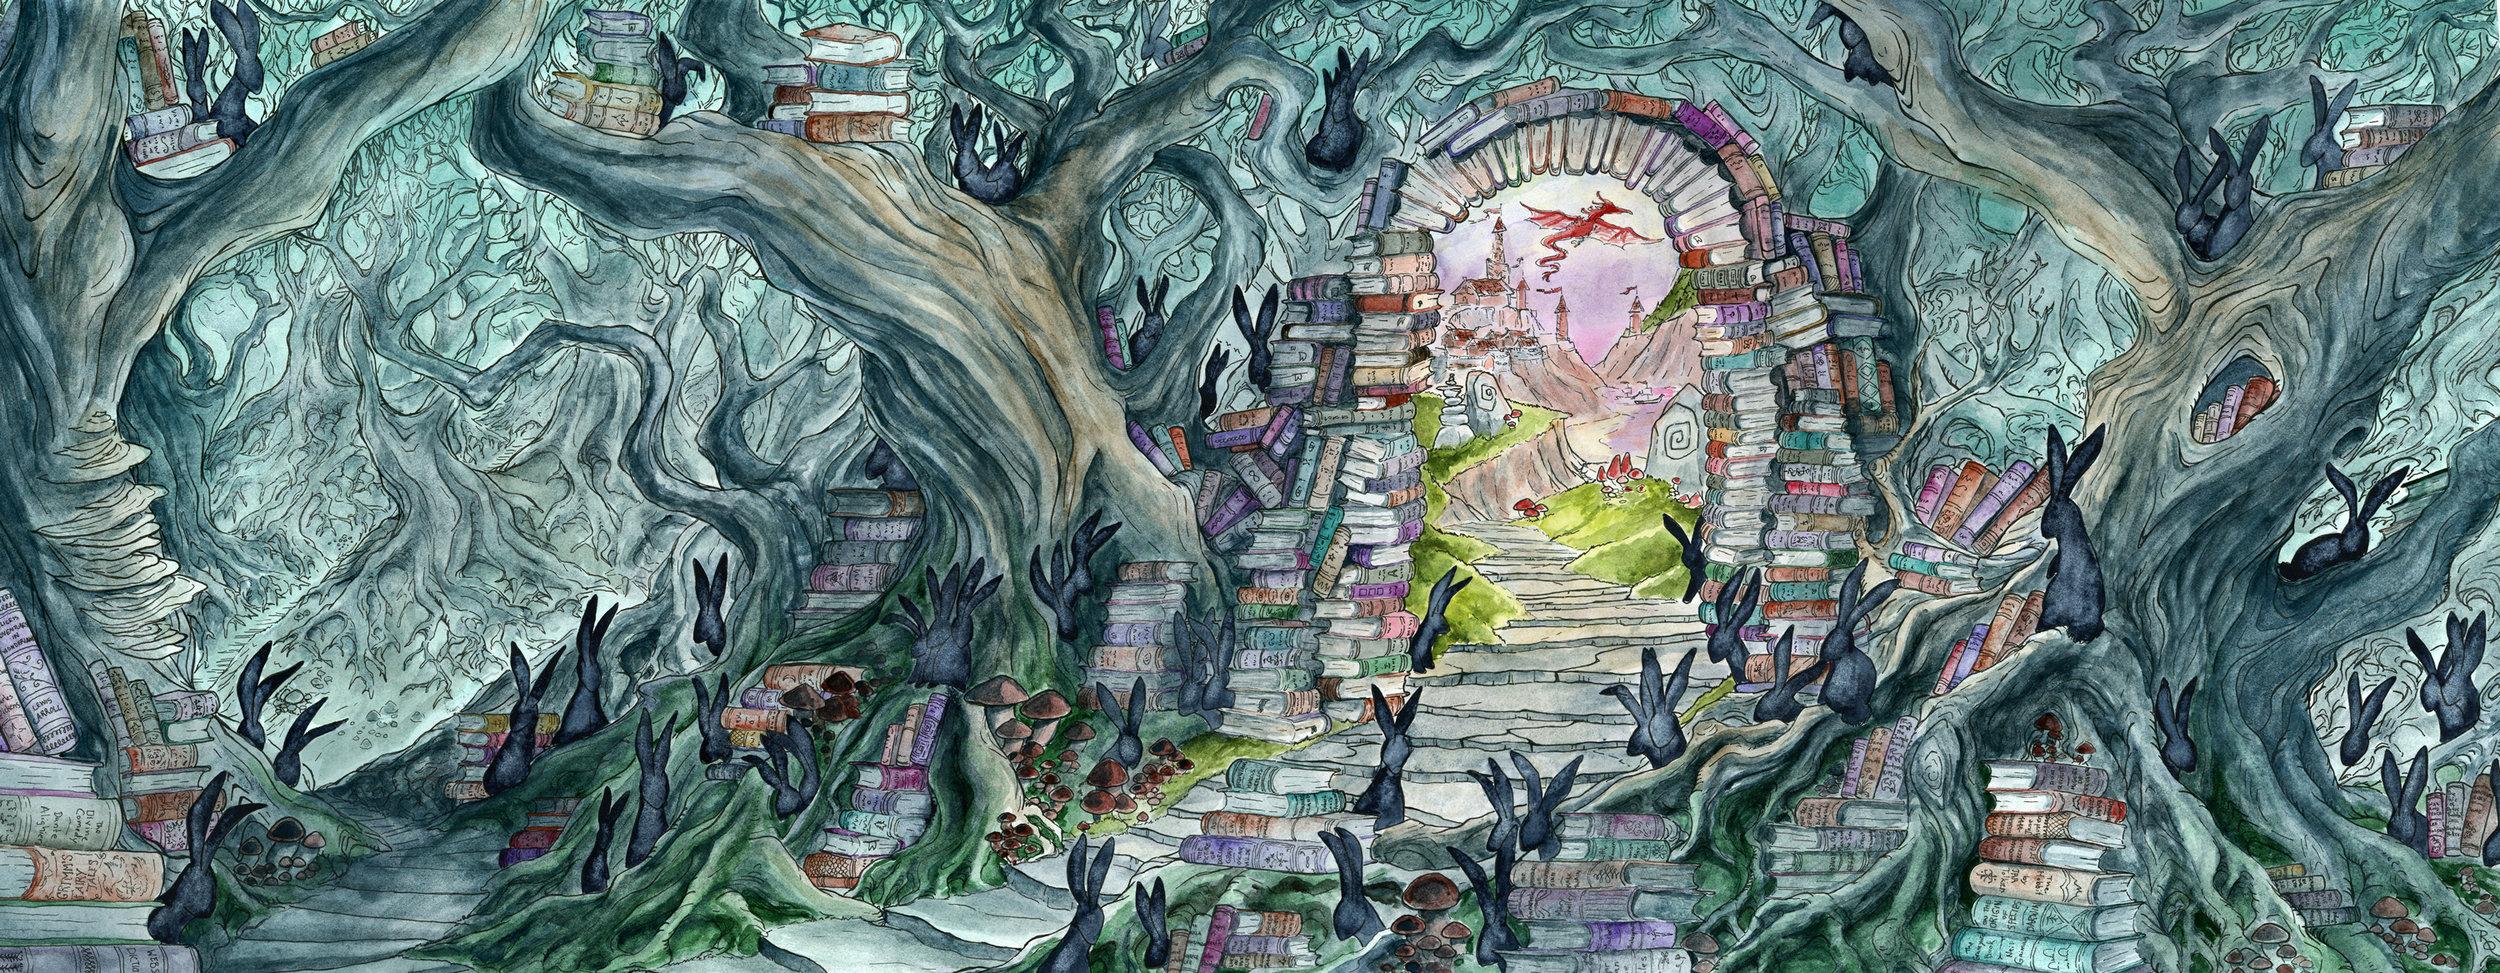 - PortalPromotional Illustration for the Detroit Festival of Bookswatercolor, ink, gouache